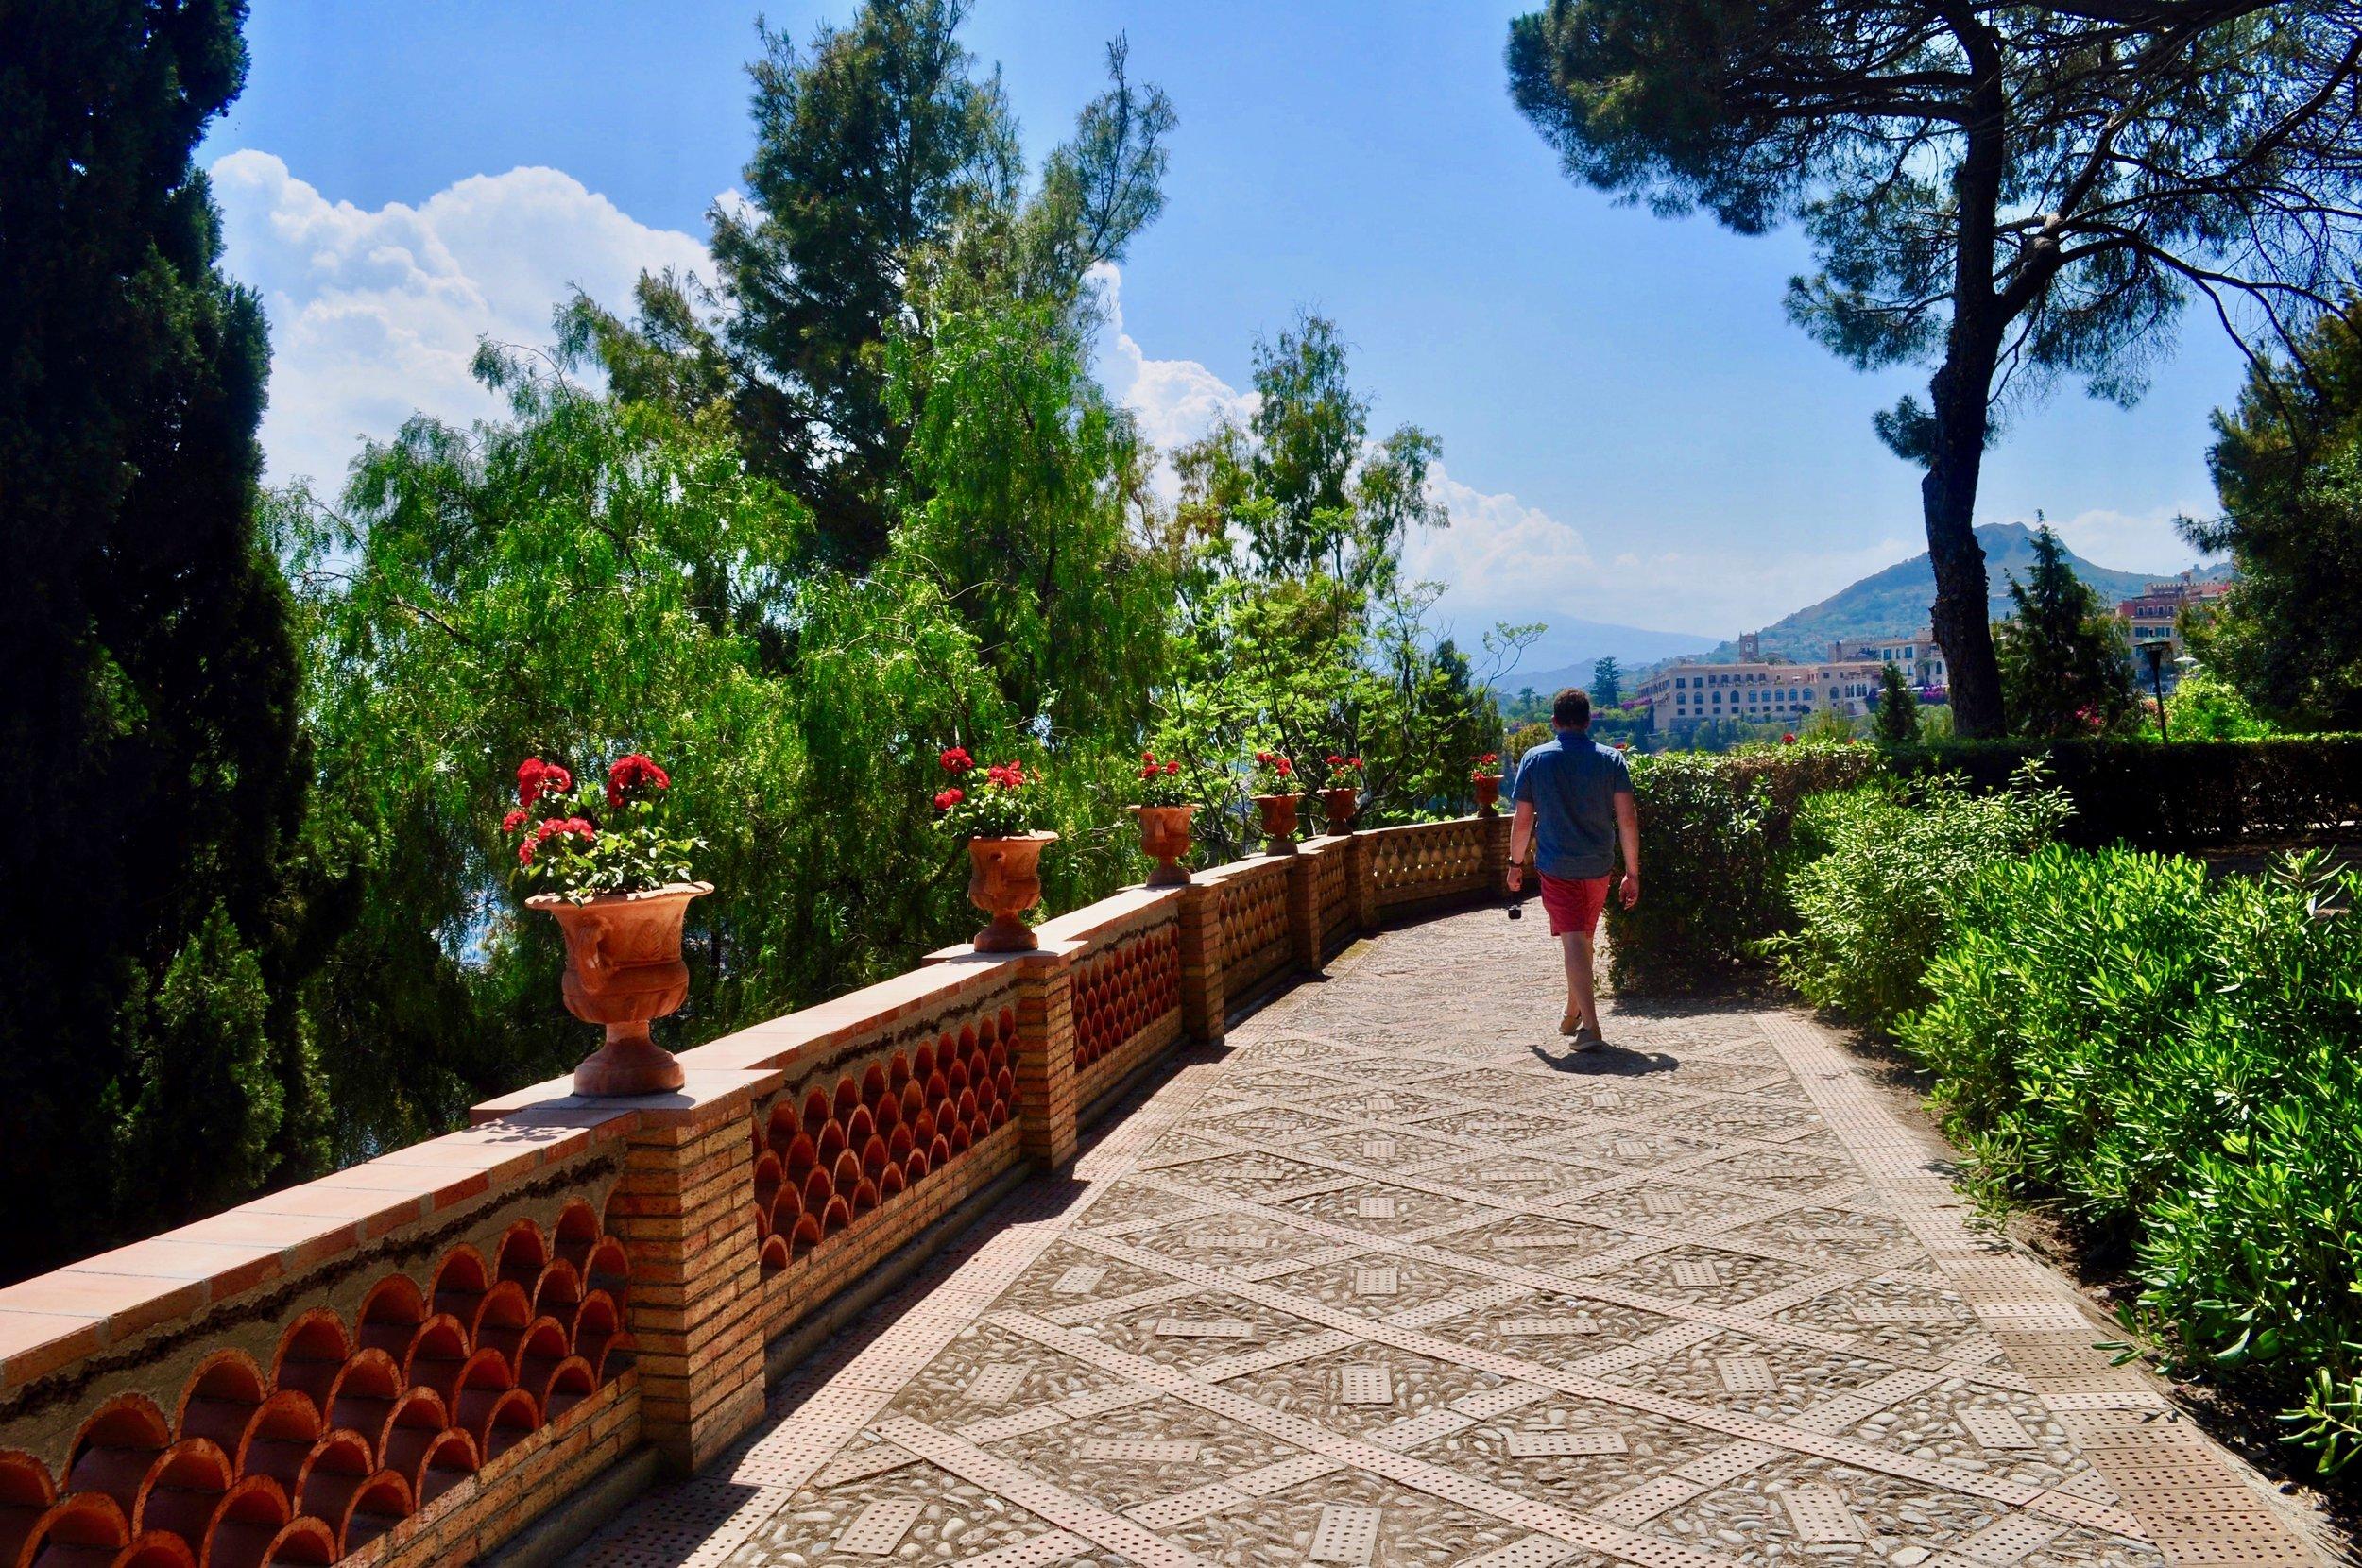 Villa Comunale - Public Gardens - in Taormina